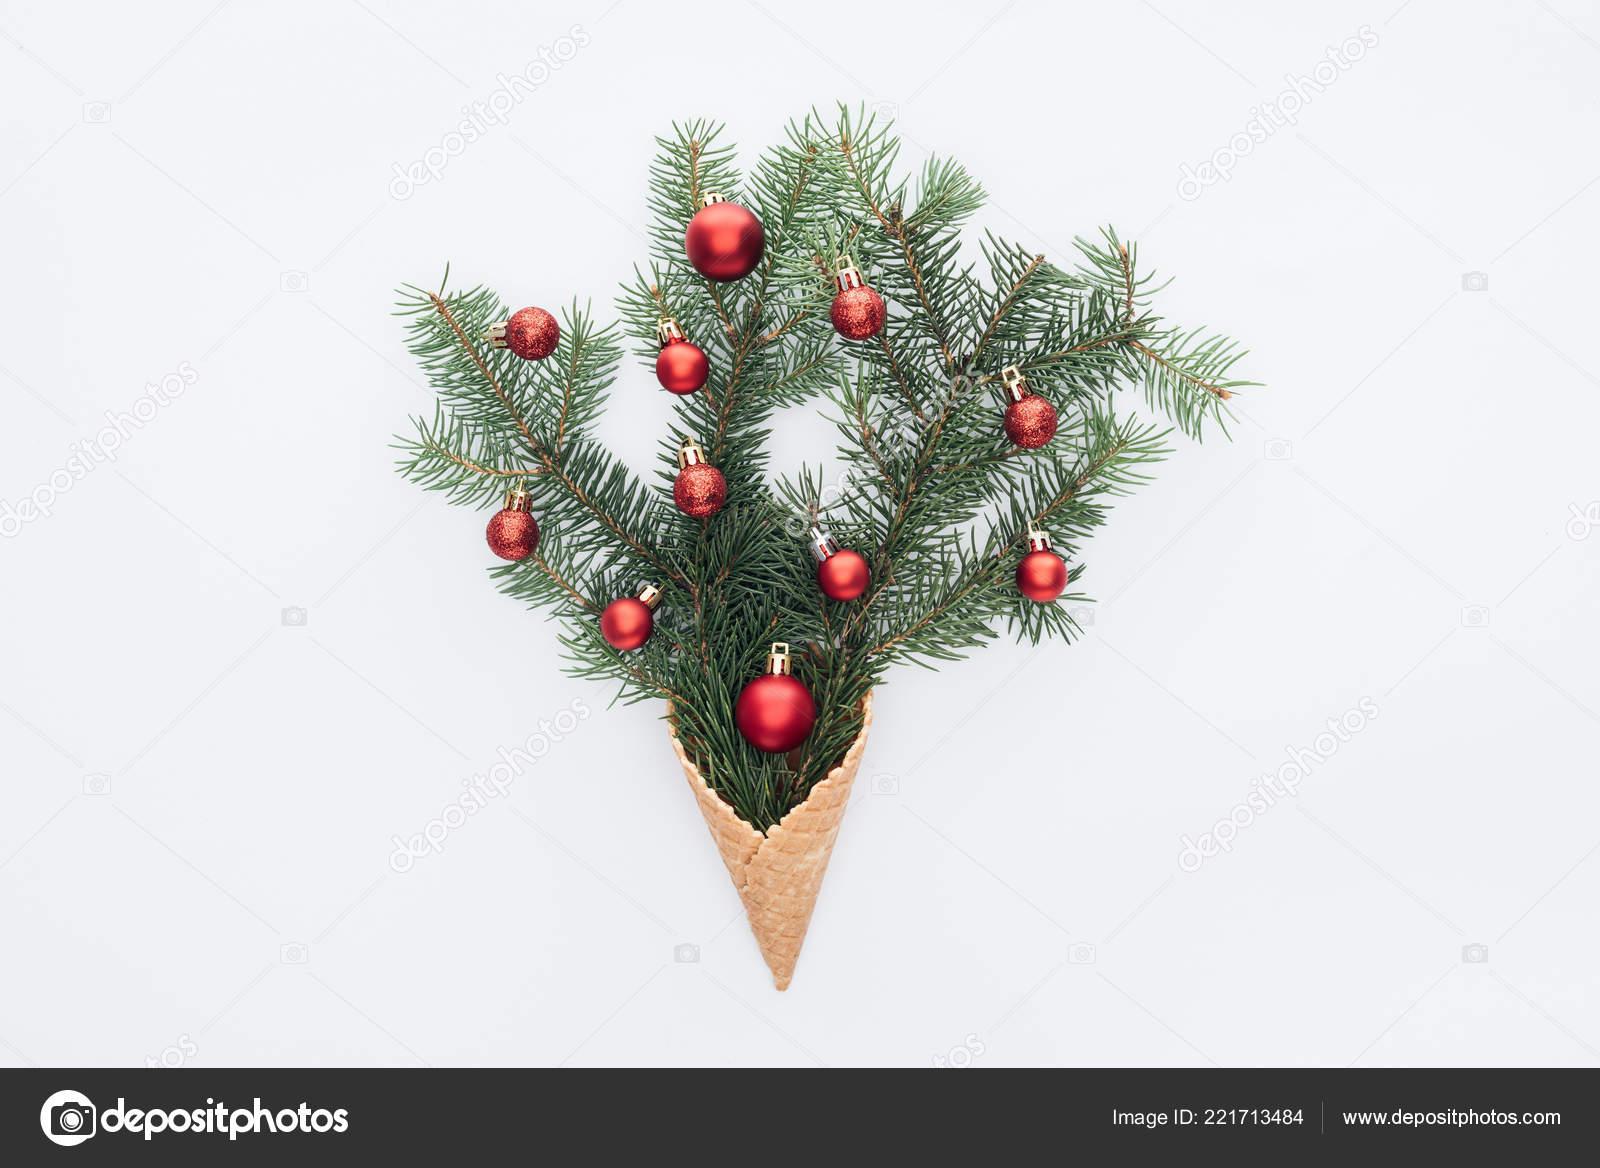 Top View Red Christmas Toys Pine Tree Branches Ice Cream Stock Photo C Vadimvasenin 221713484